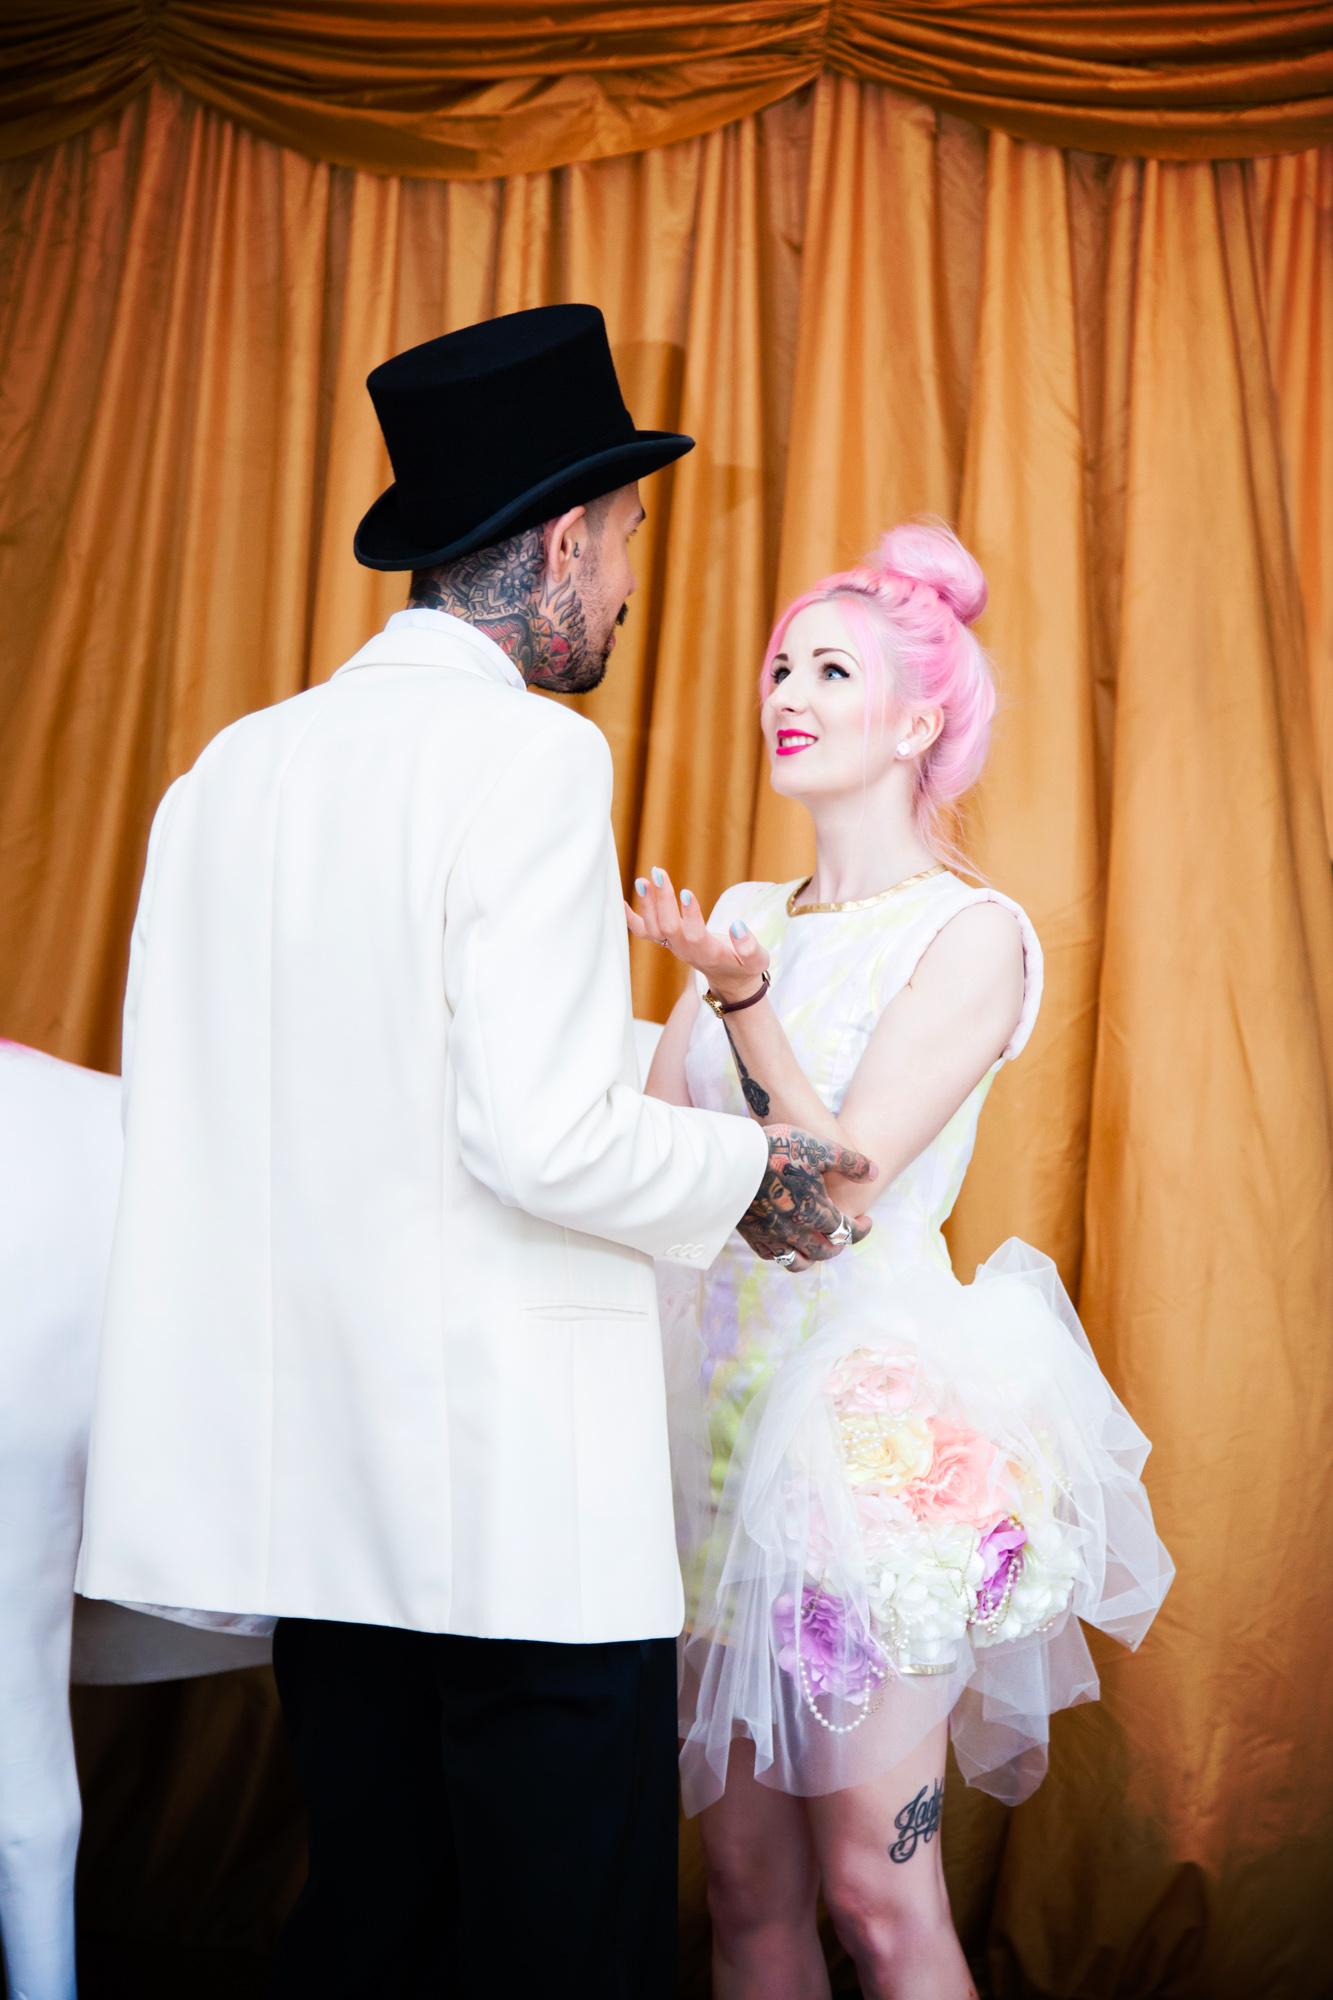 04_07_14_Richard_And_Amanda_Wedding_Martin_0269_FOR_WEB